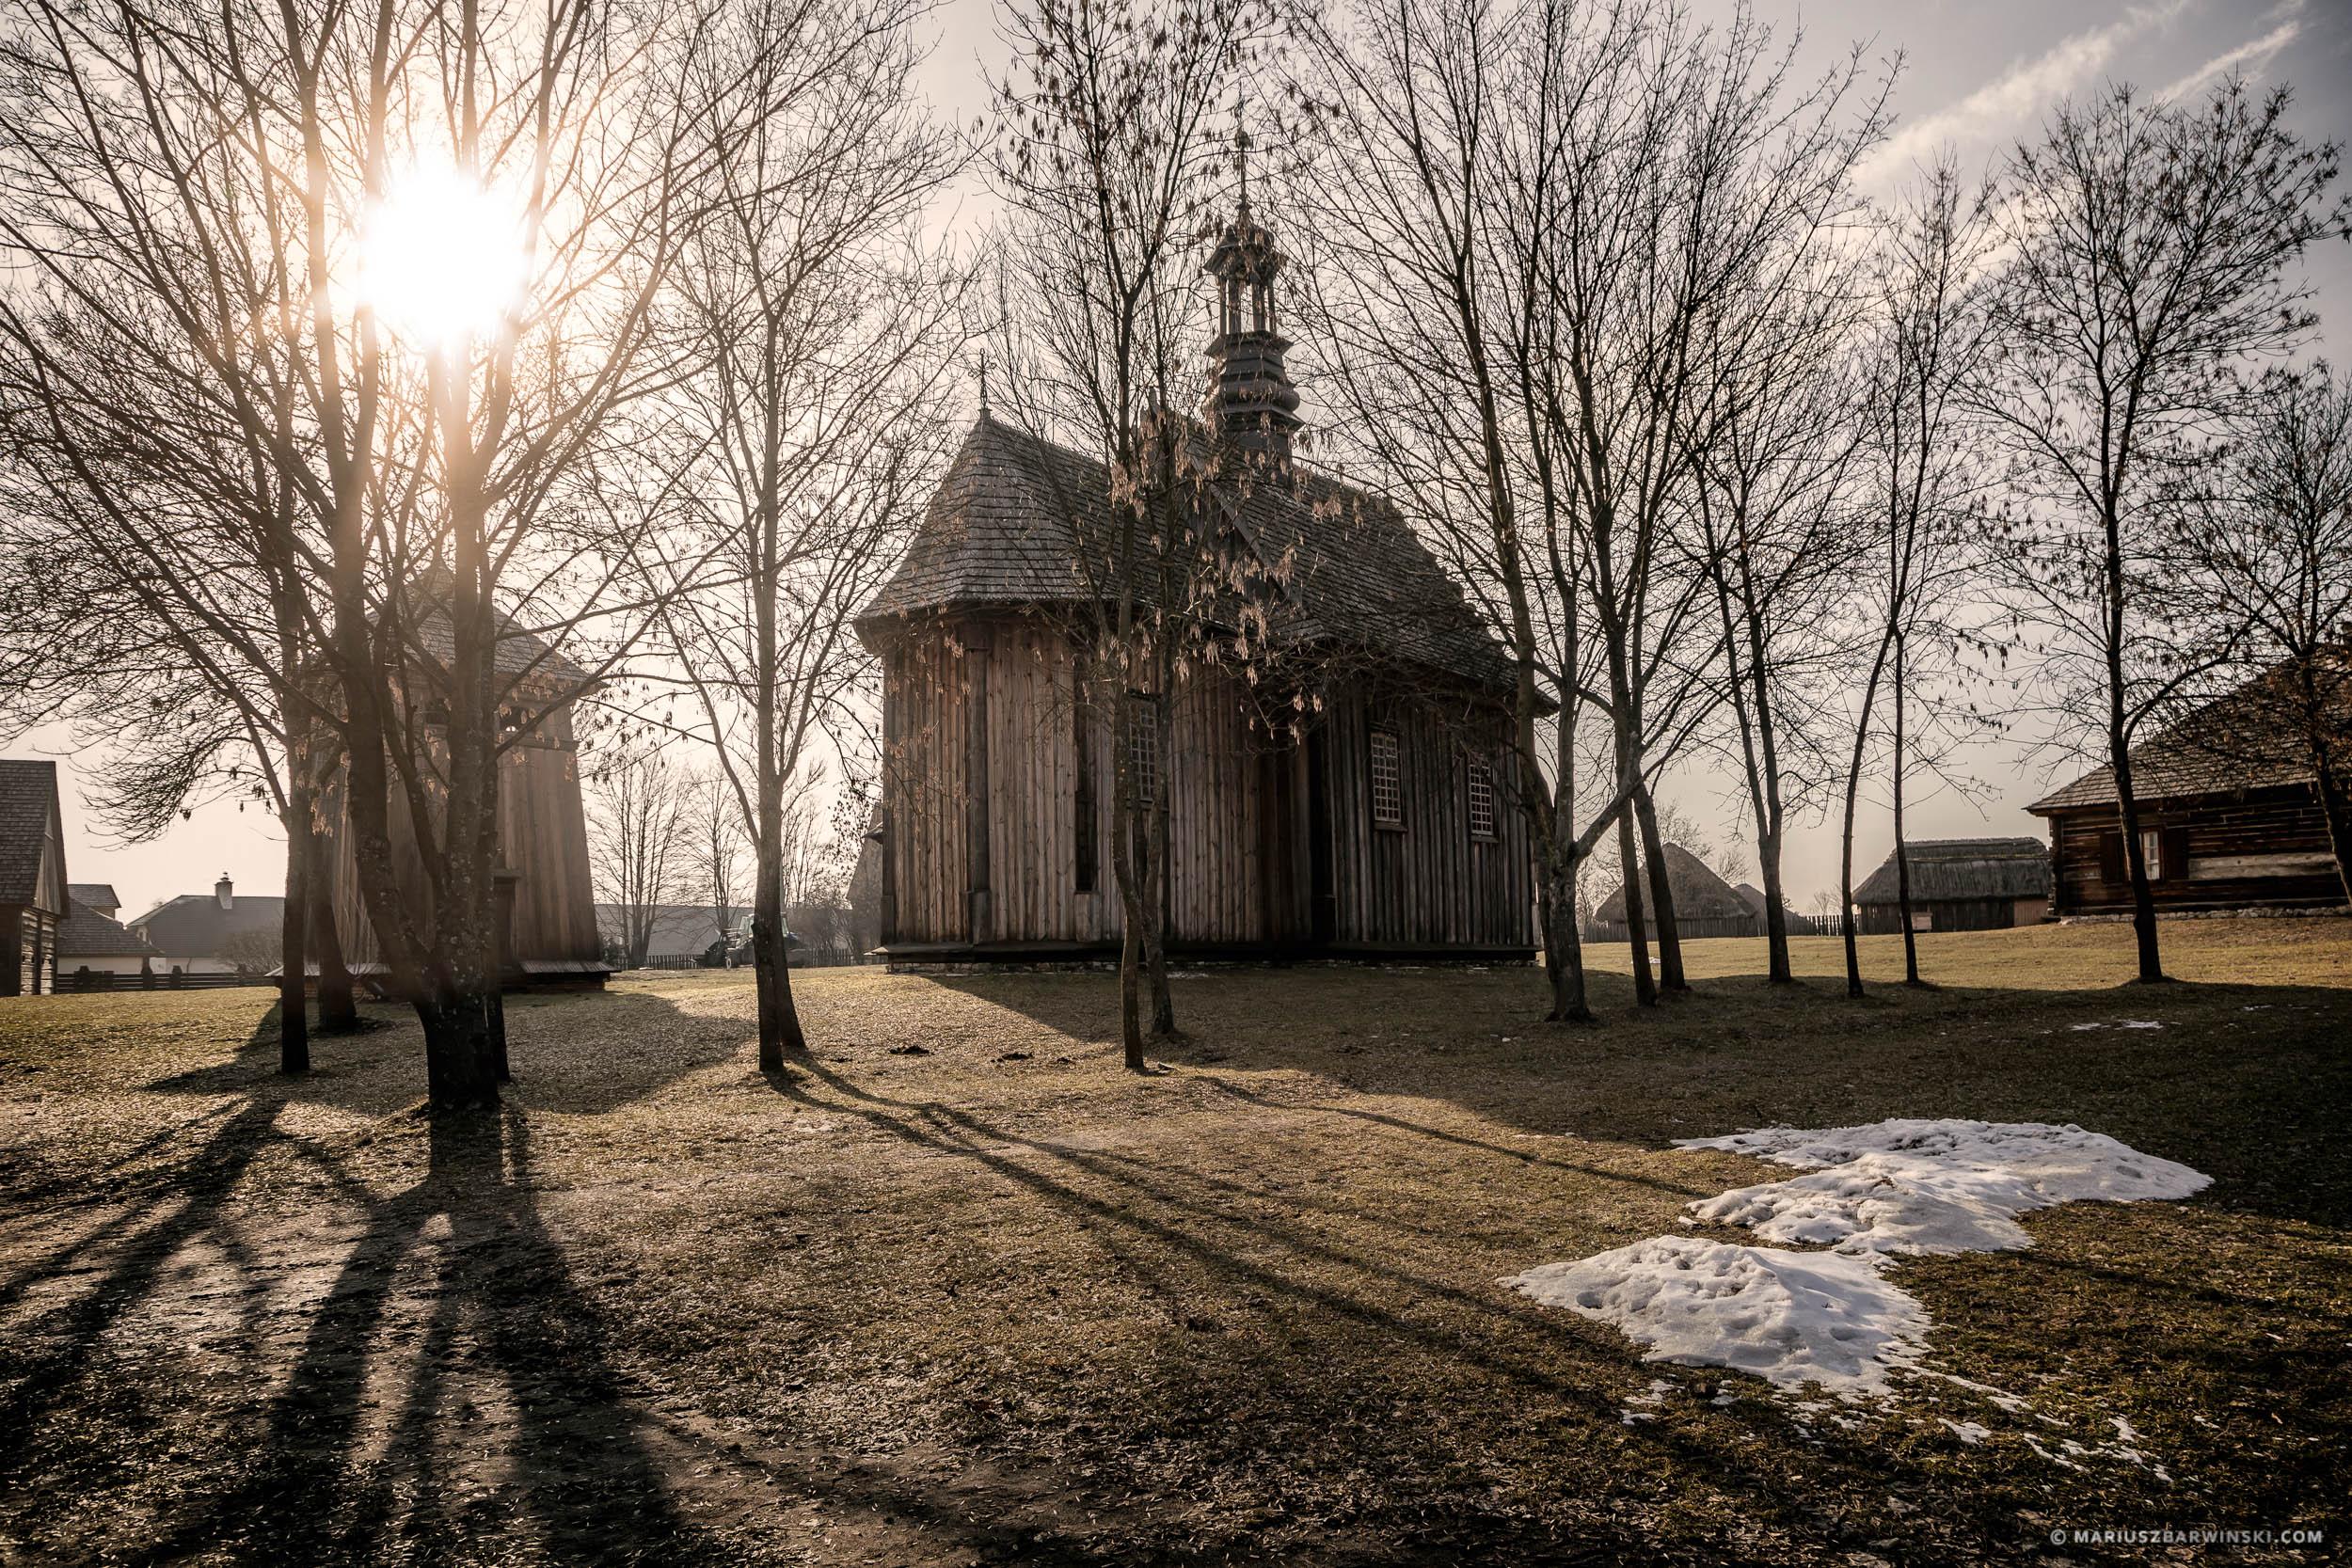 Old wooden church in open air-museum. Tokarnia. Kościół szpit